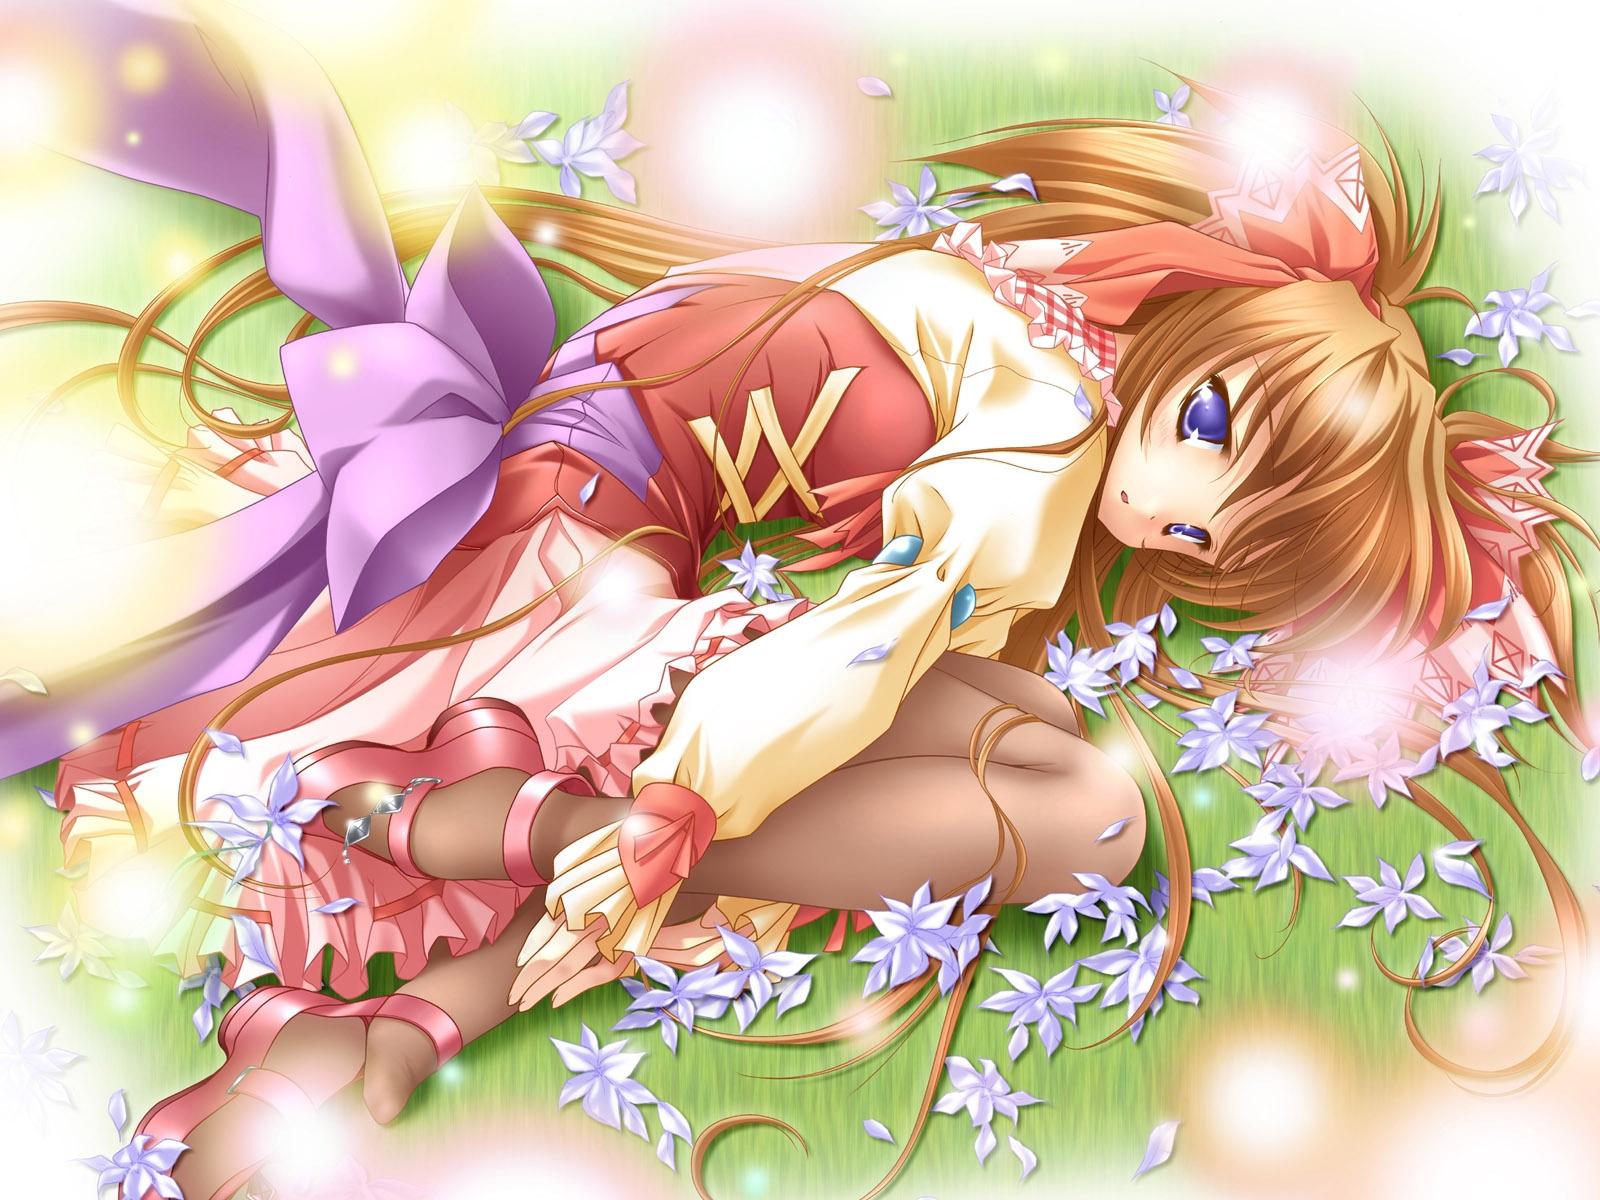 Illustration Flowers Anime Bow Cartoon Flower Cute Girl Posture Mangaka